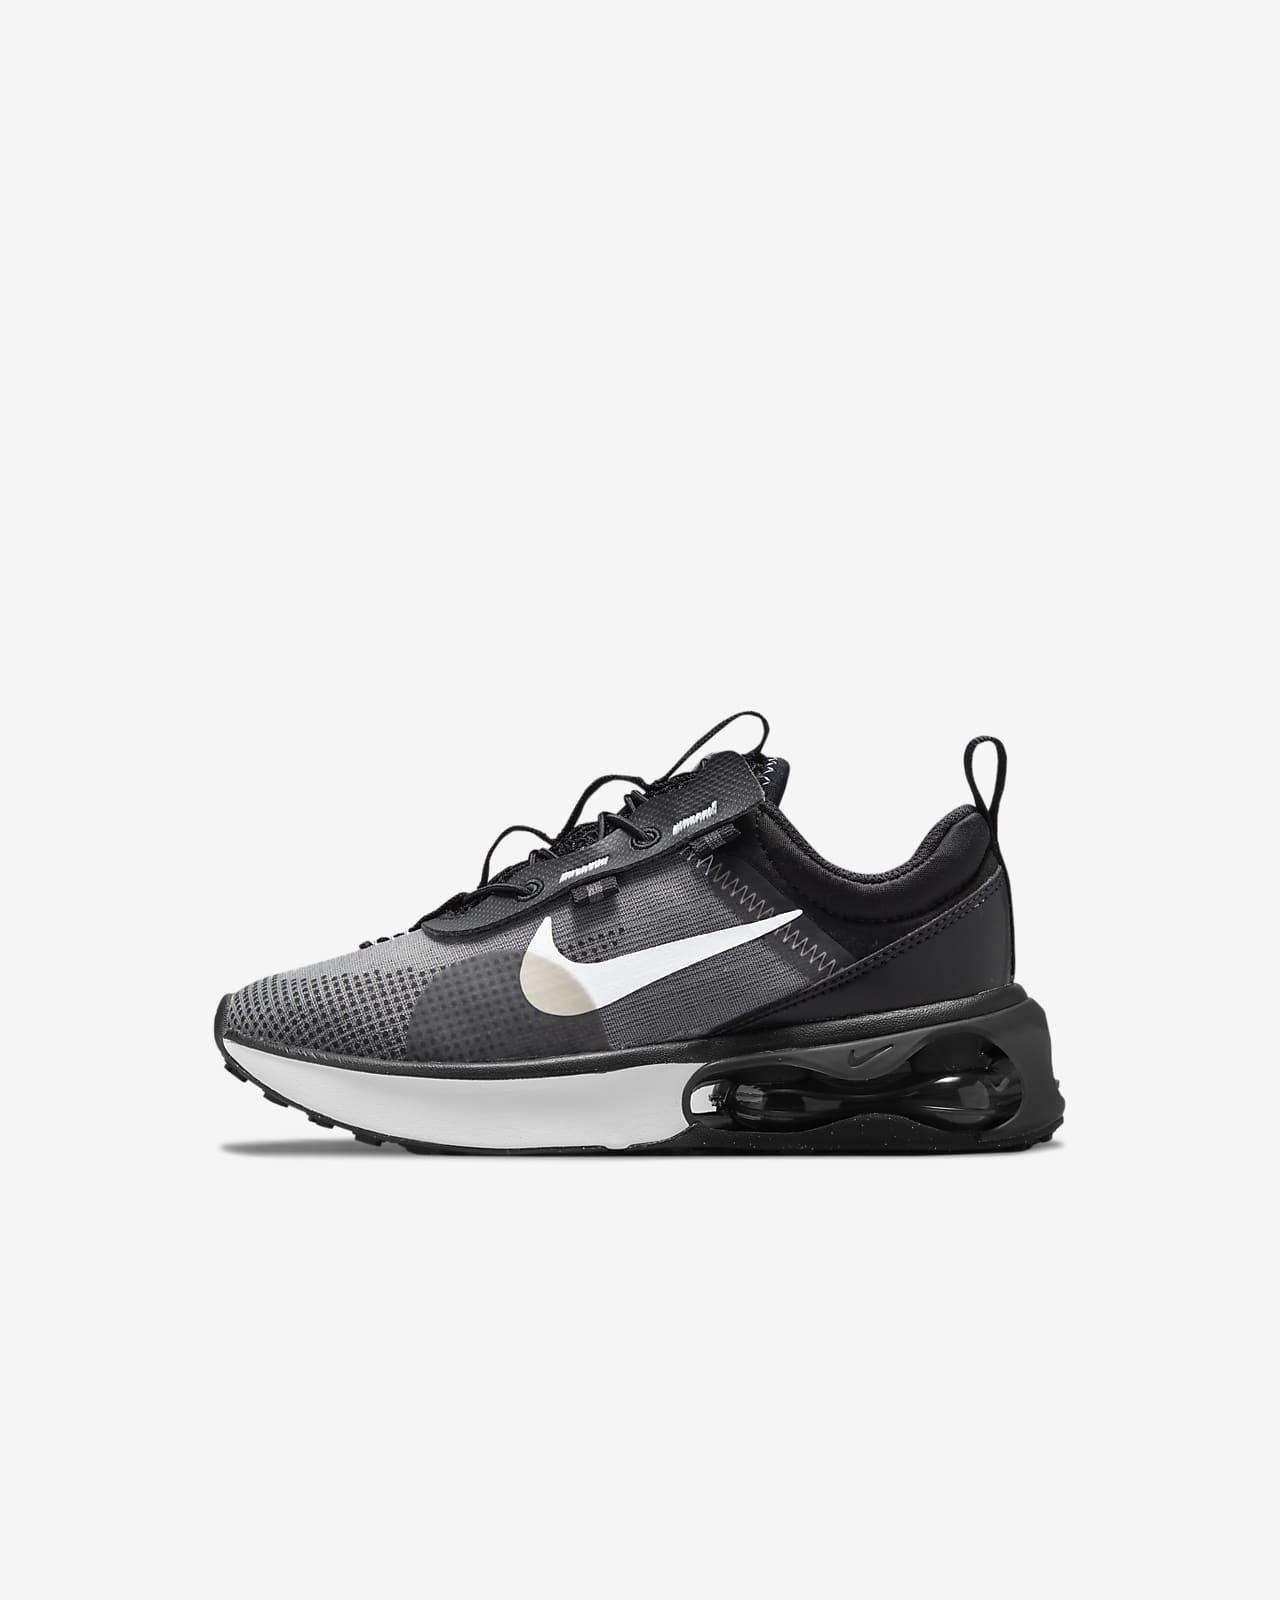 Chaussure Nike Air Max 2021 pour Jeune enfant. Nike LU